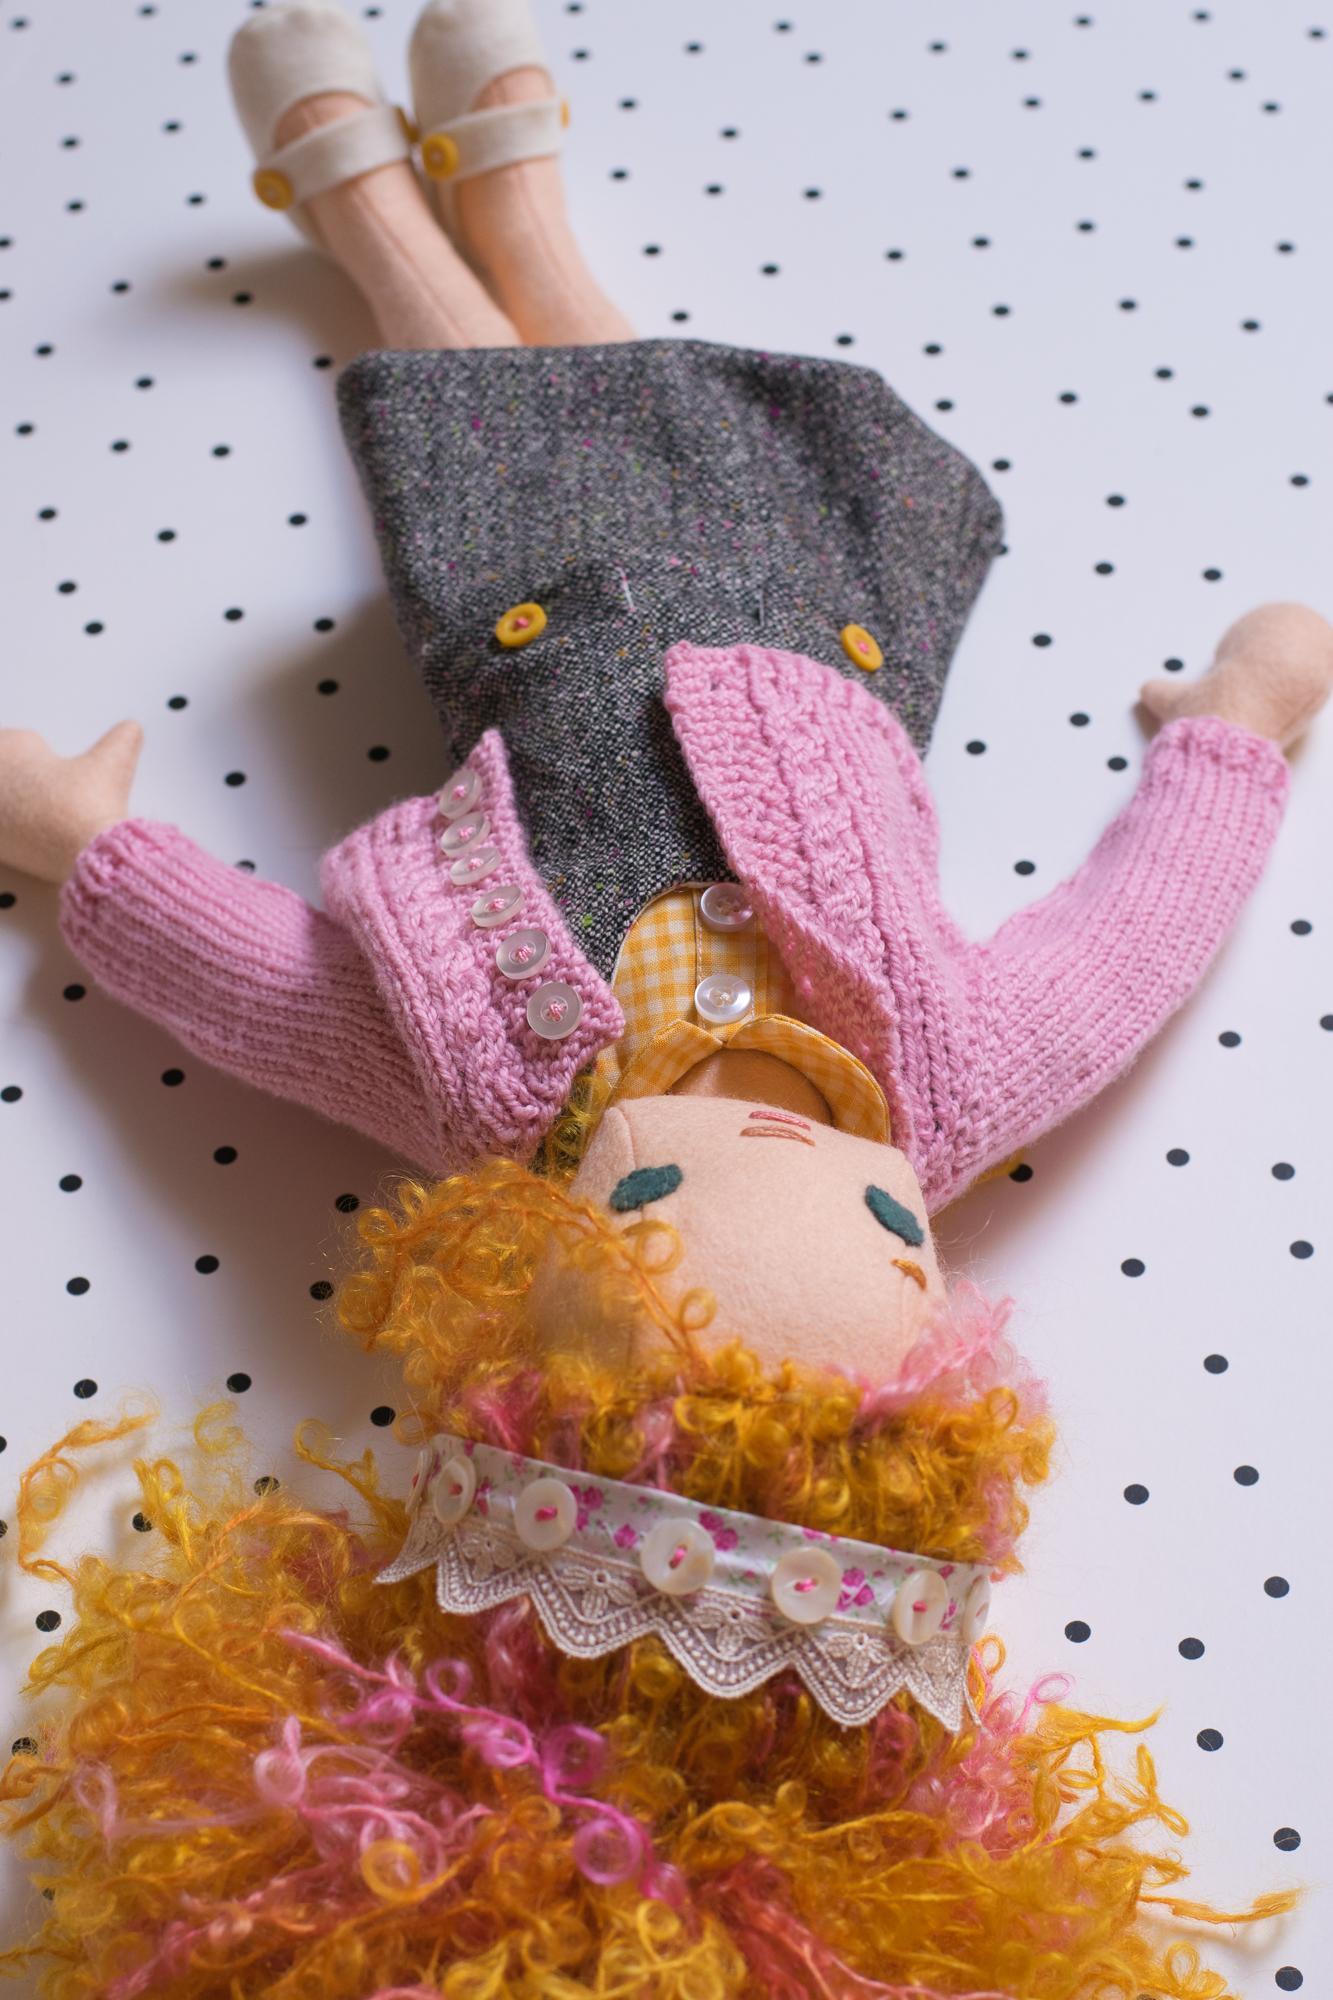 Custom doll ready to go